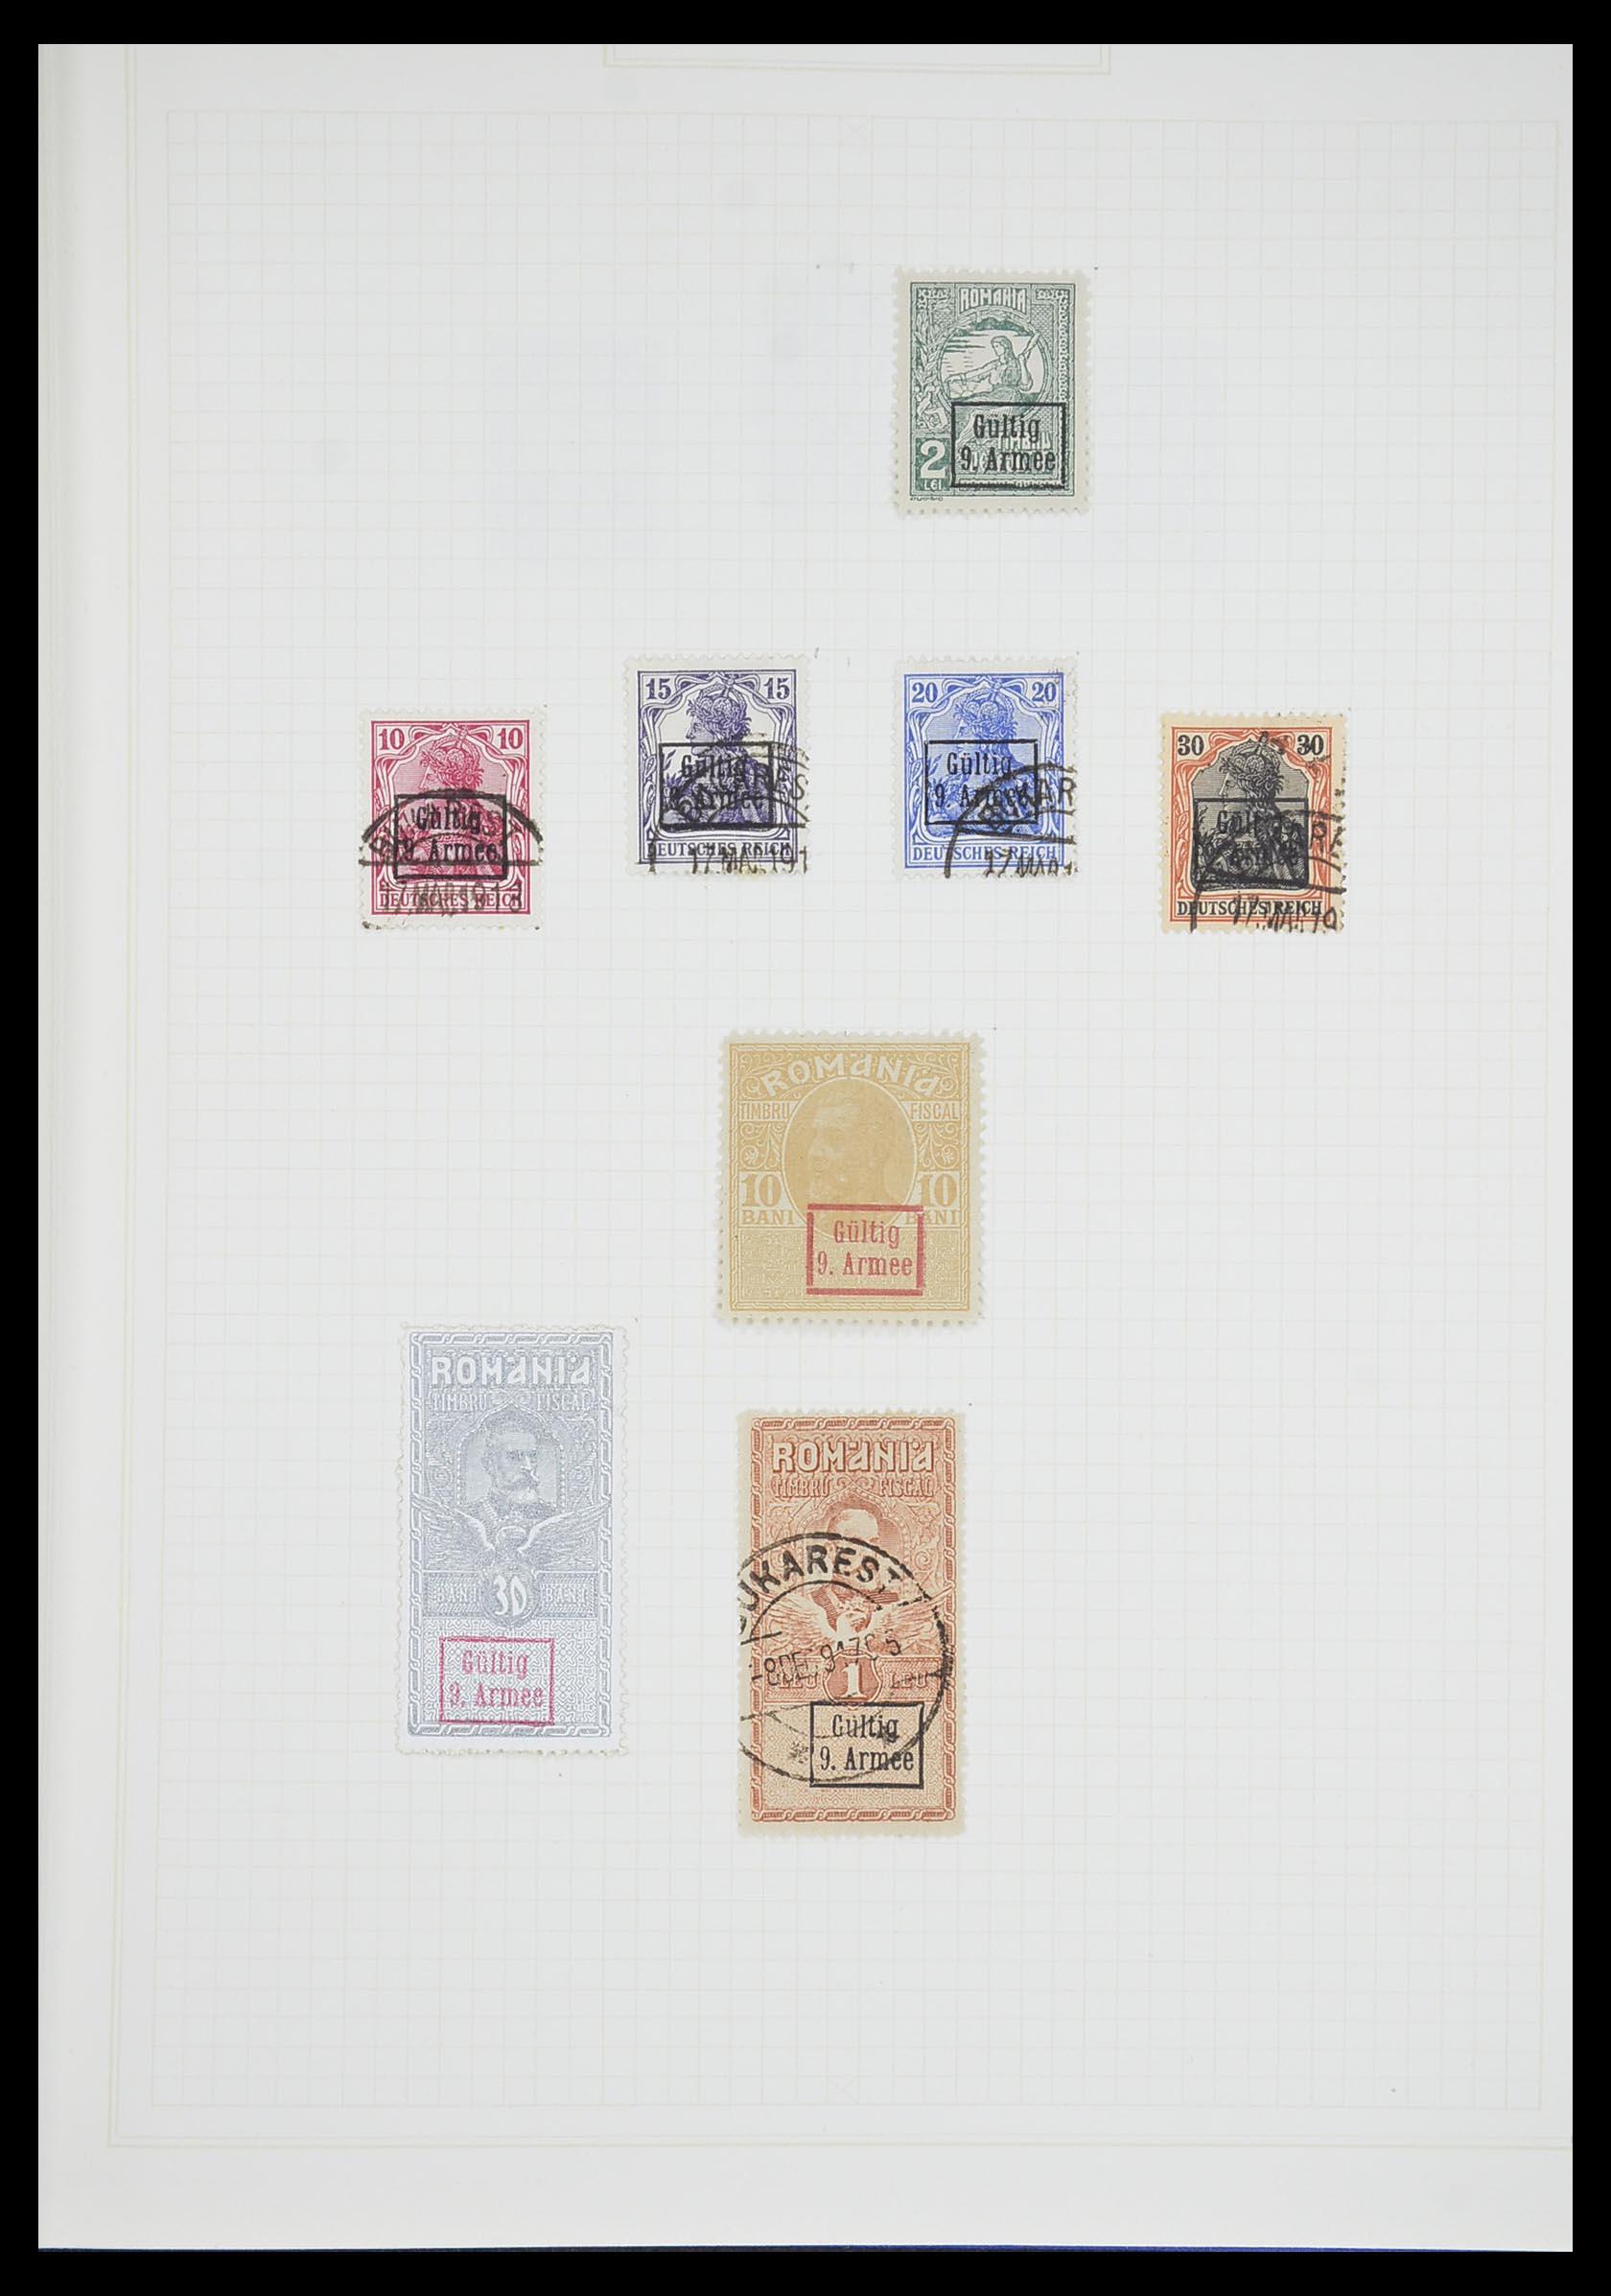 33713 009 - Postzegelverzameling 33713 Duitse bezettingen WO I en WO II 1914-1945